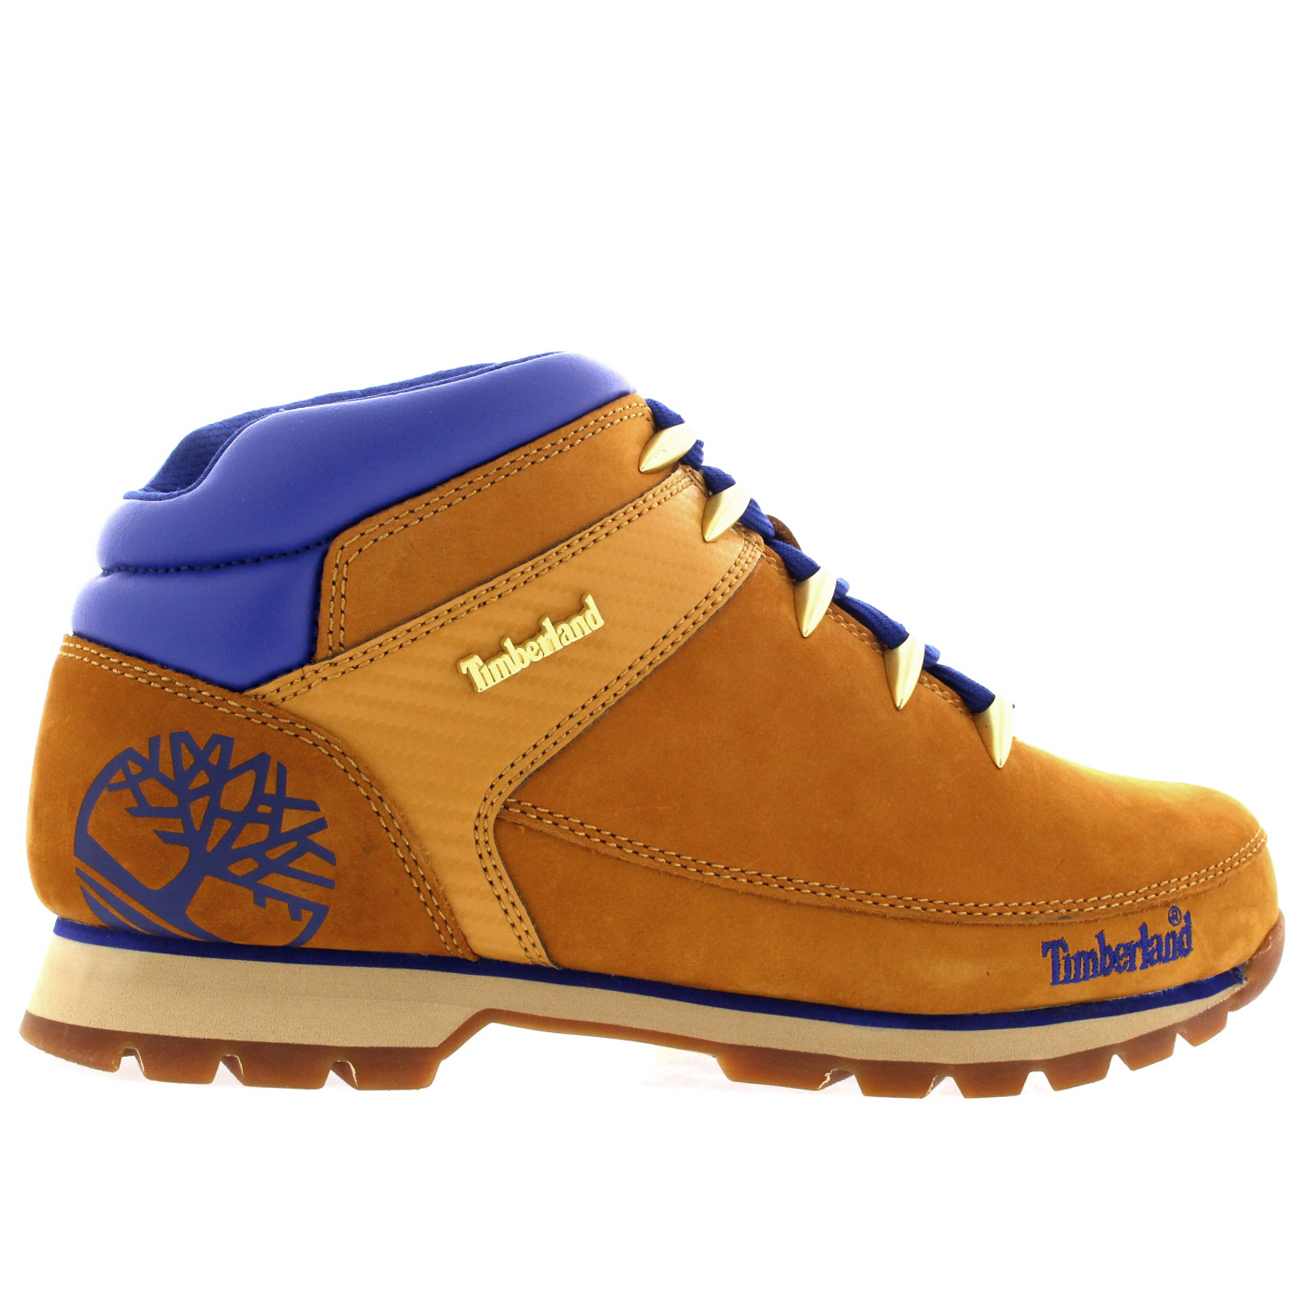 timberland euro sprint hiker boots wheat men's size